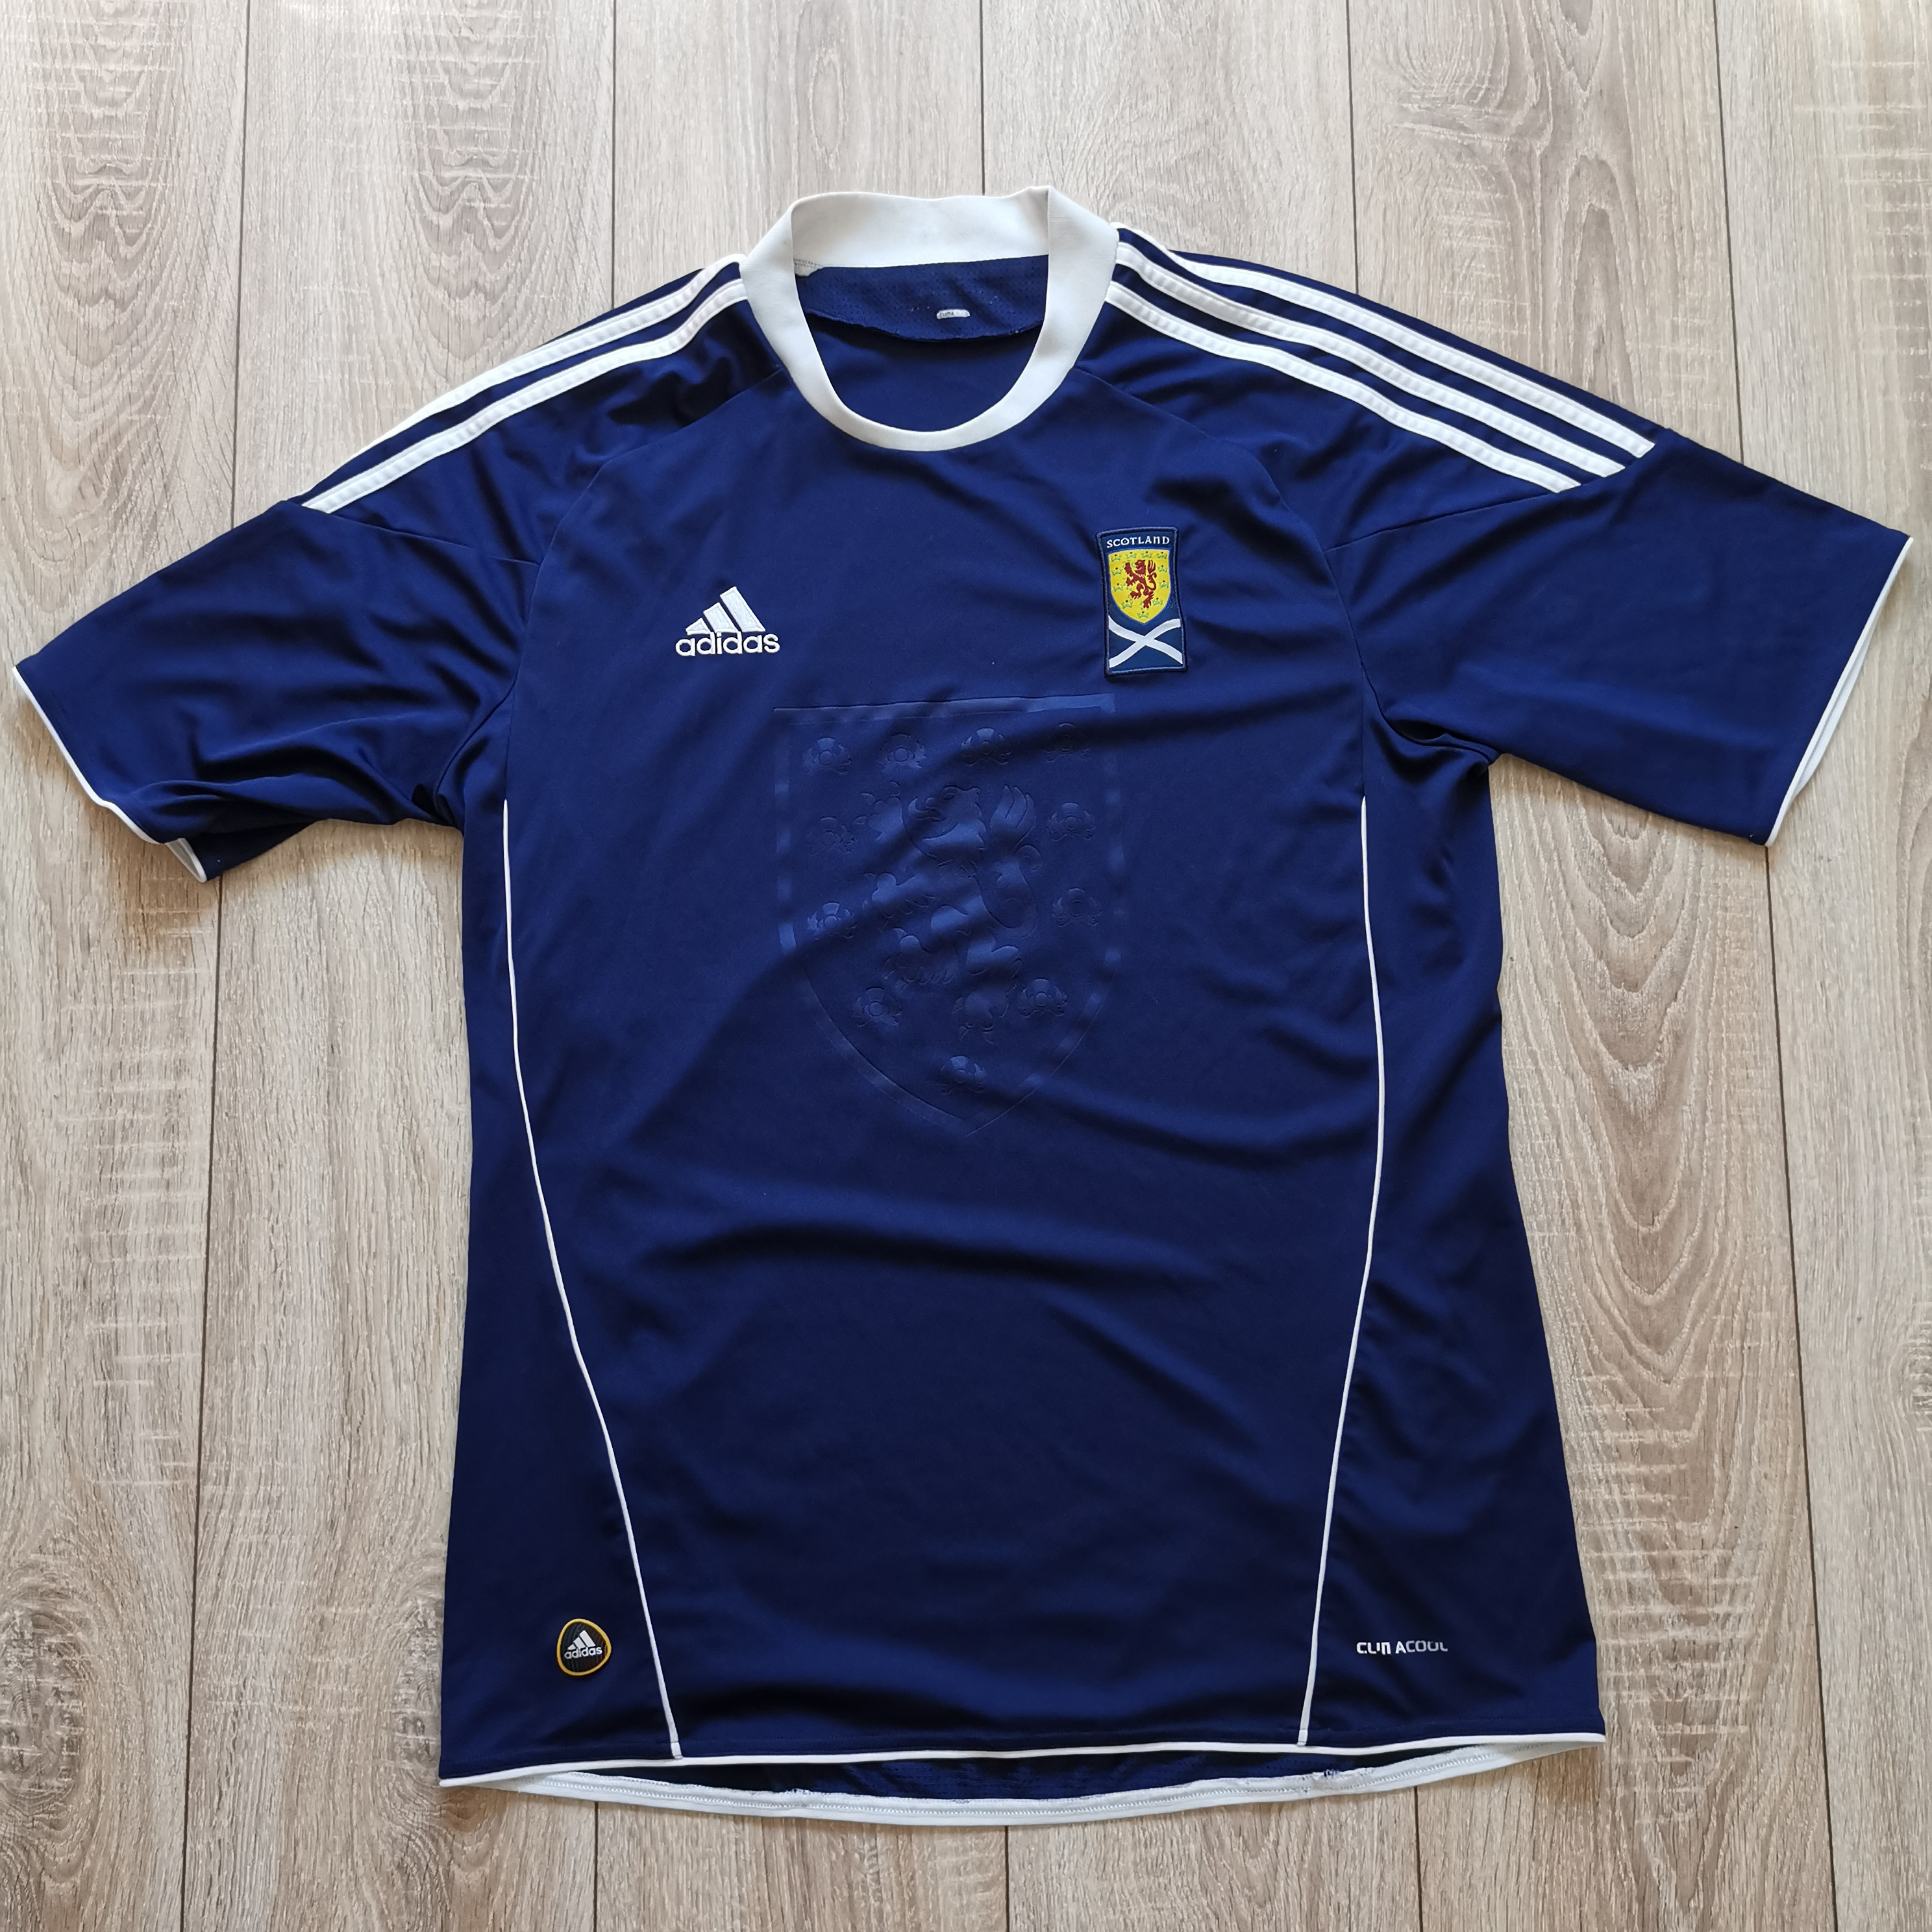 Adidas Adidas Scotland 2010 2011 home soccer jersey football shirt